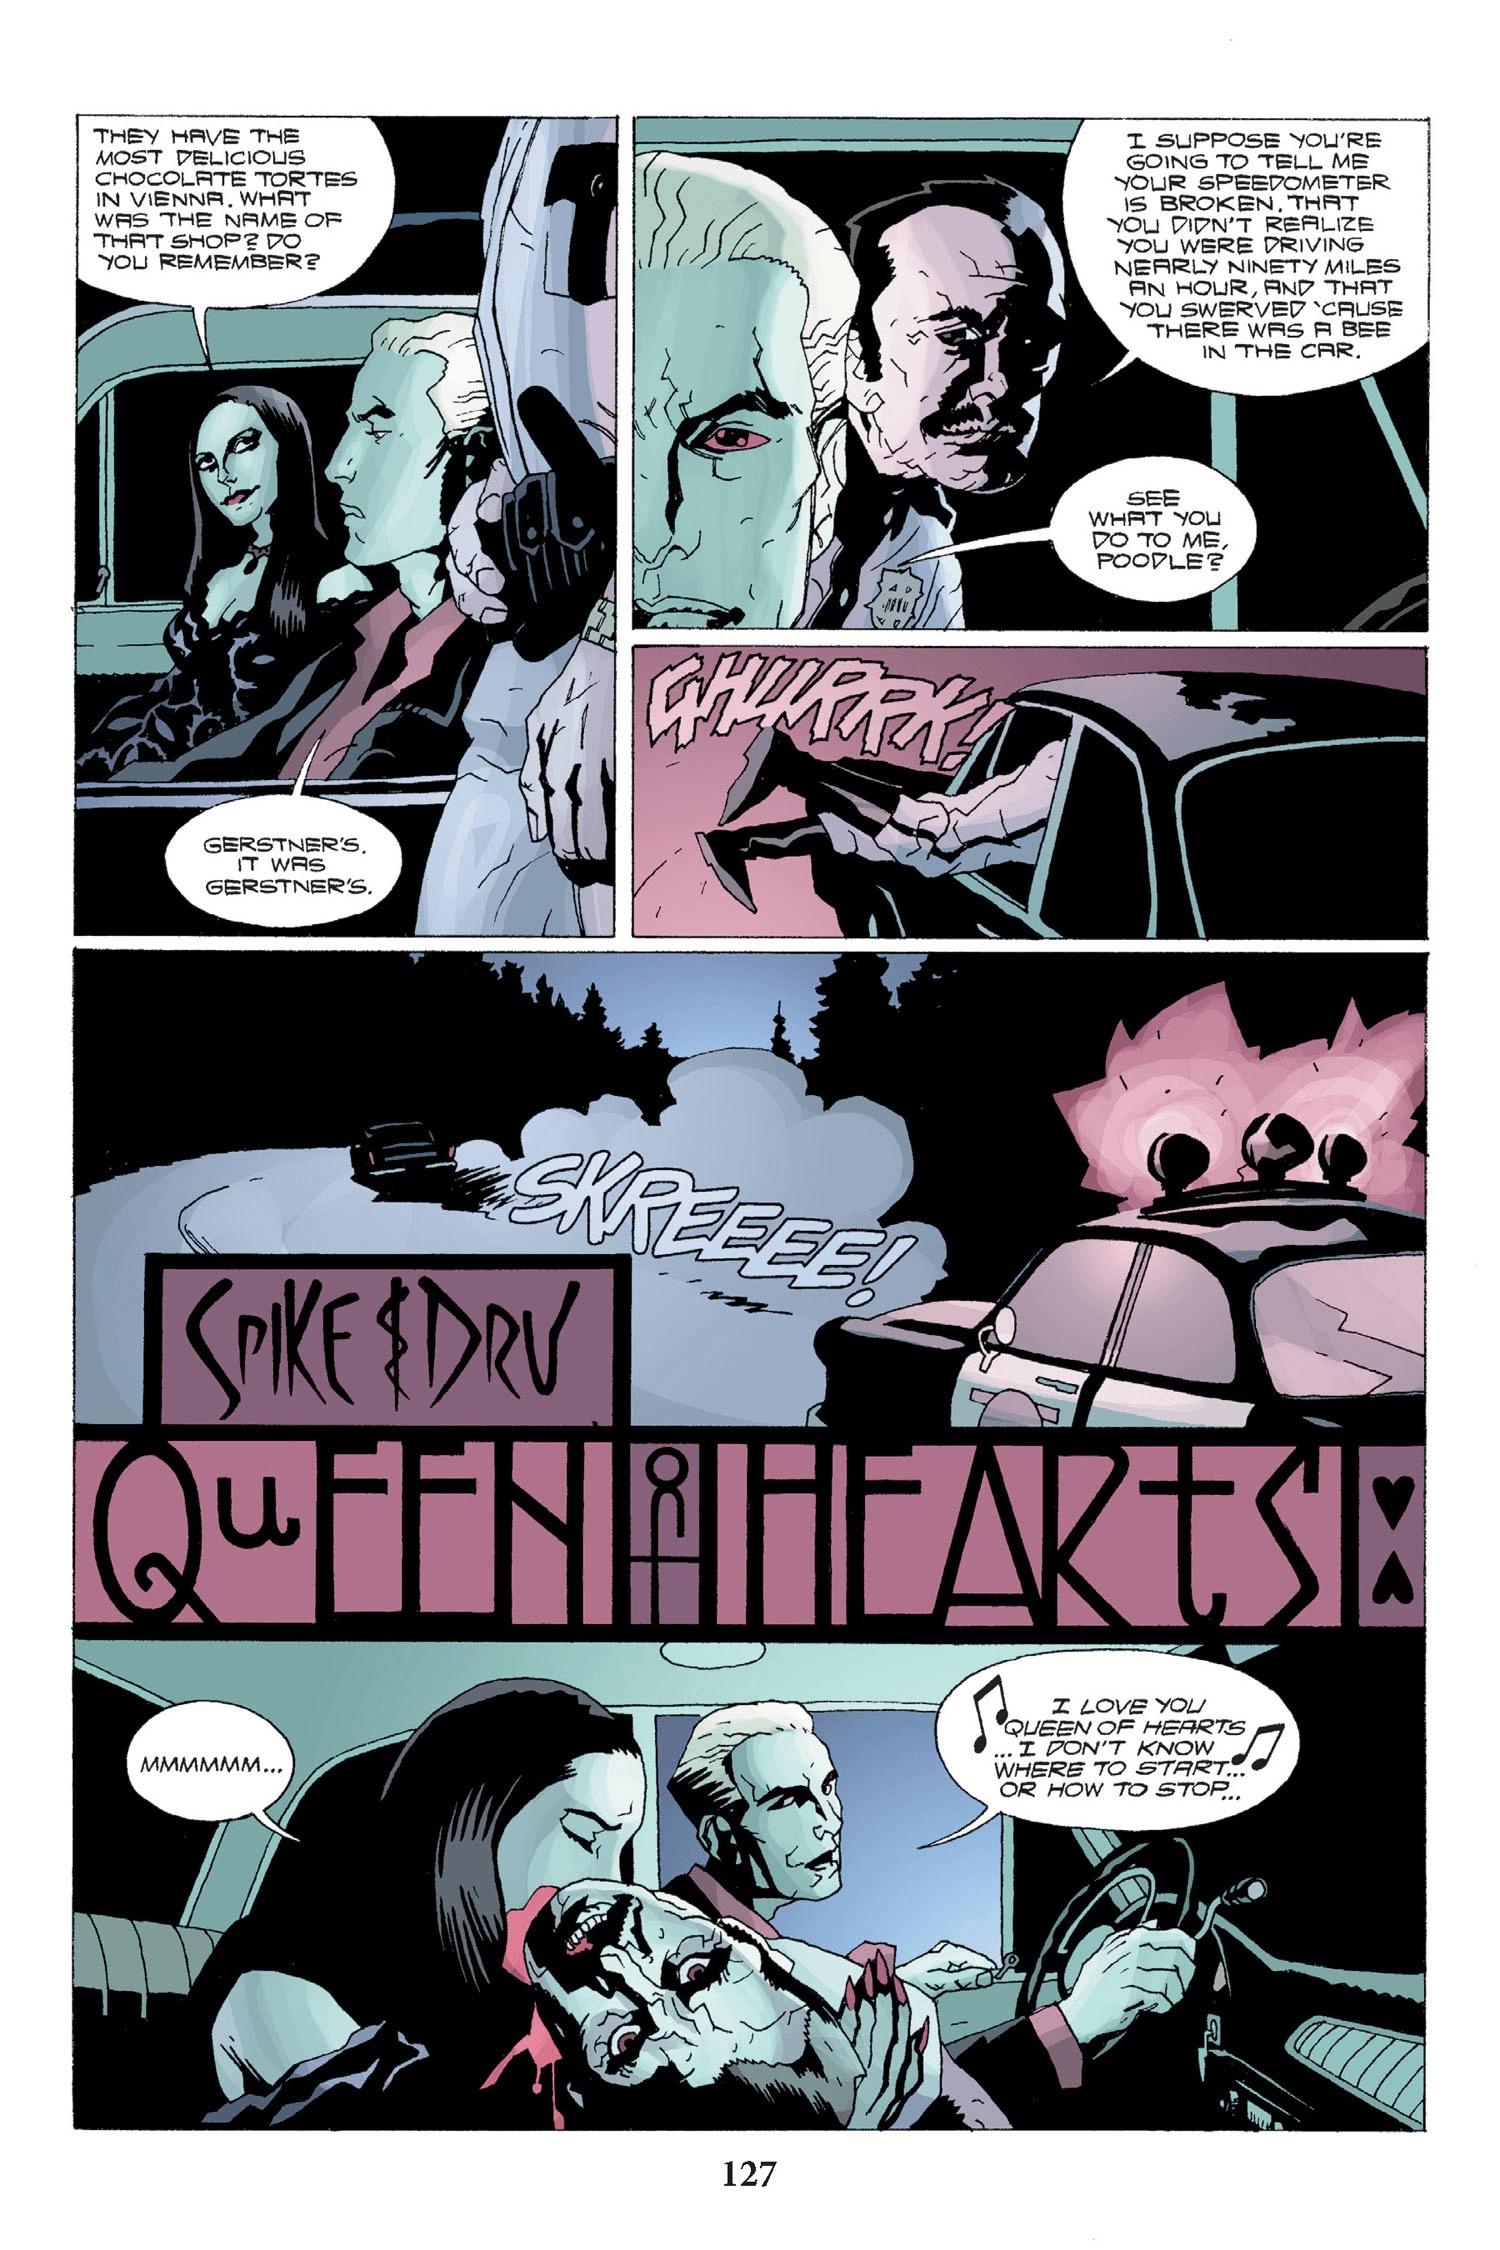 Read online Buffy the Vampire Slayer: Omnibus comic -  Issue # TPB 2 - 121